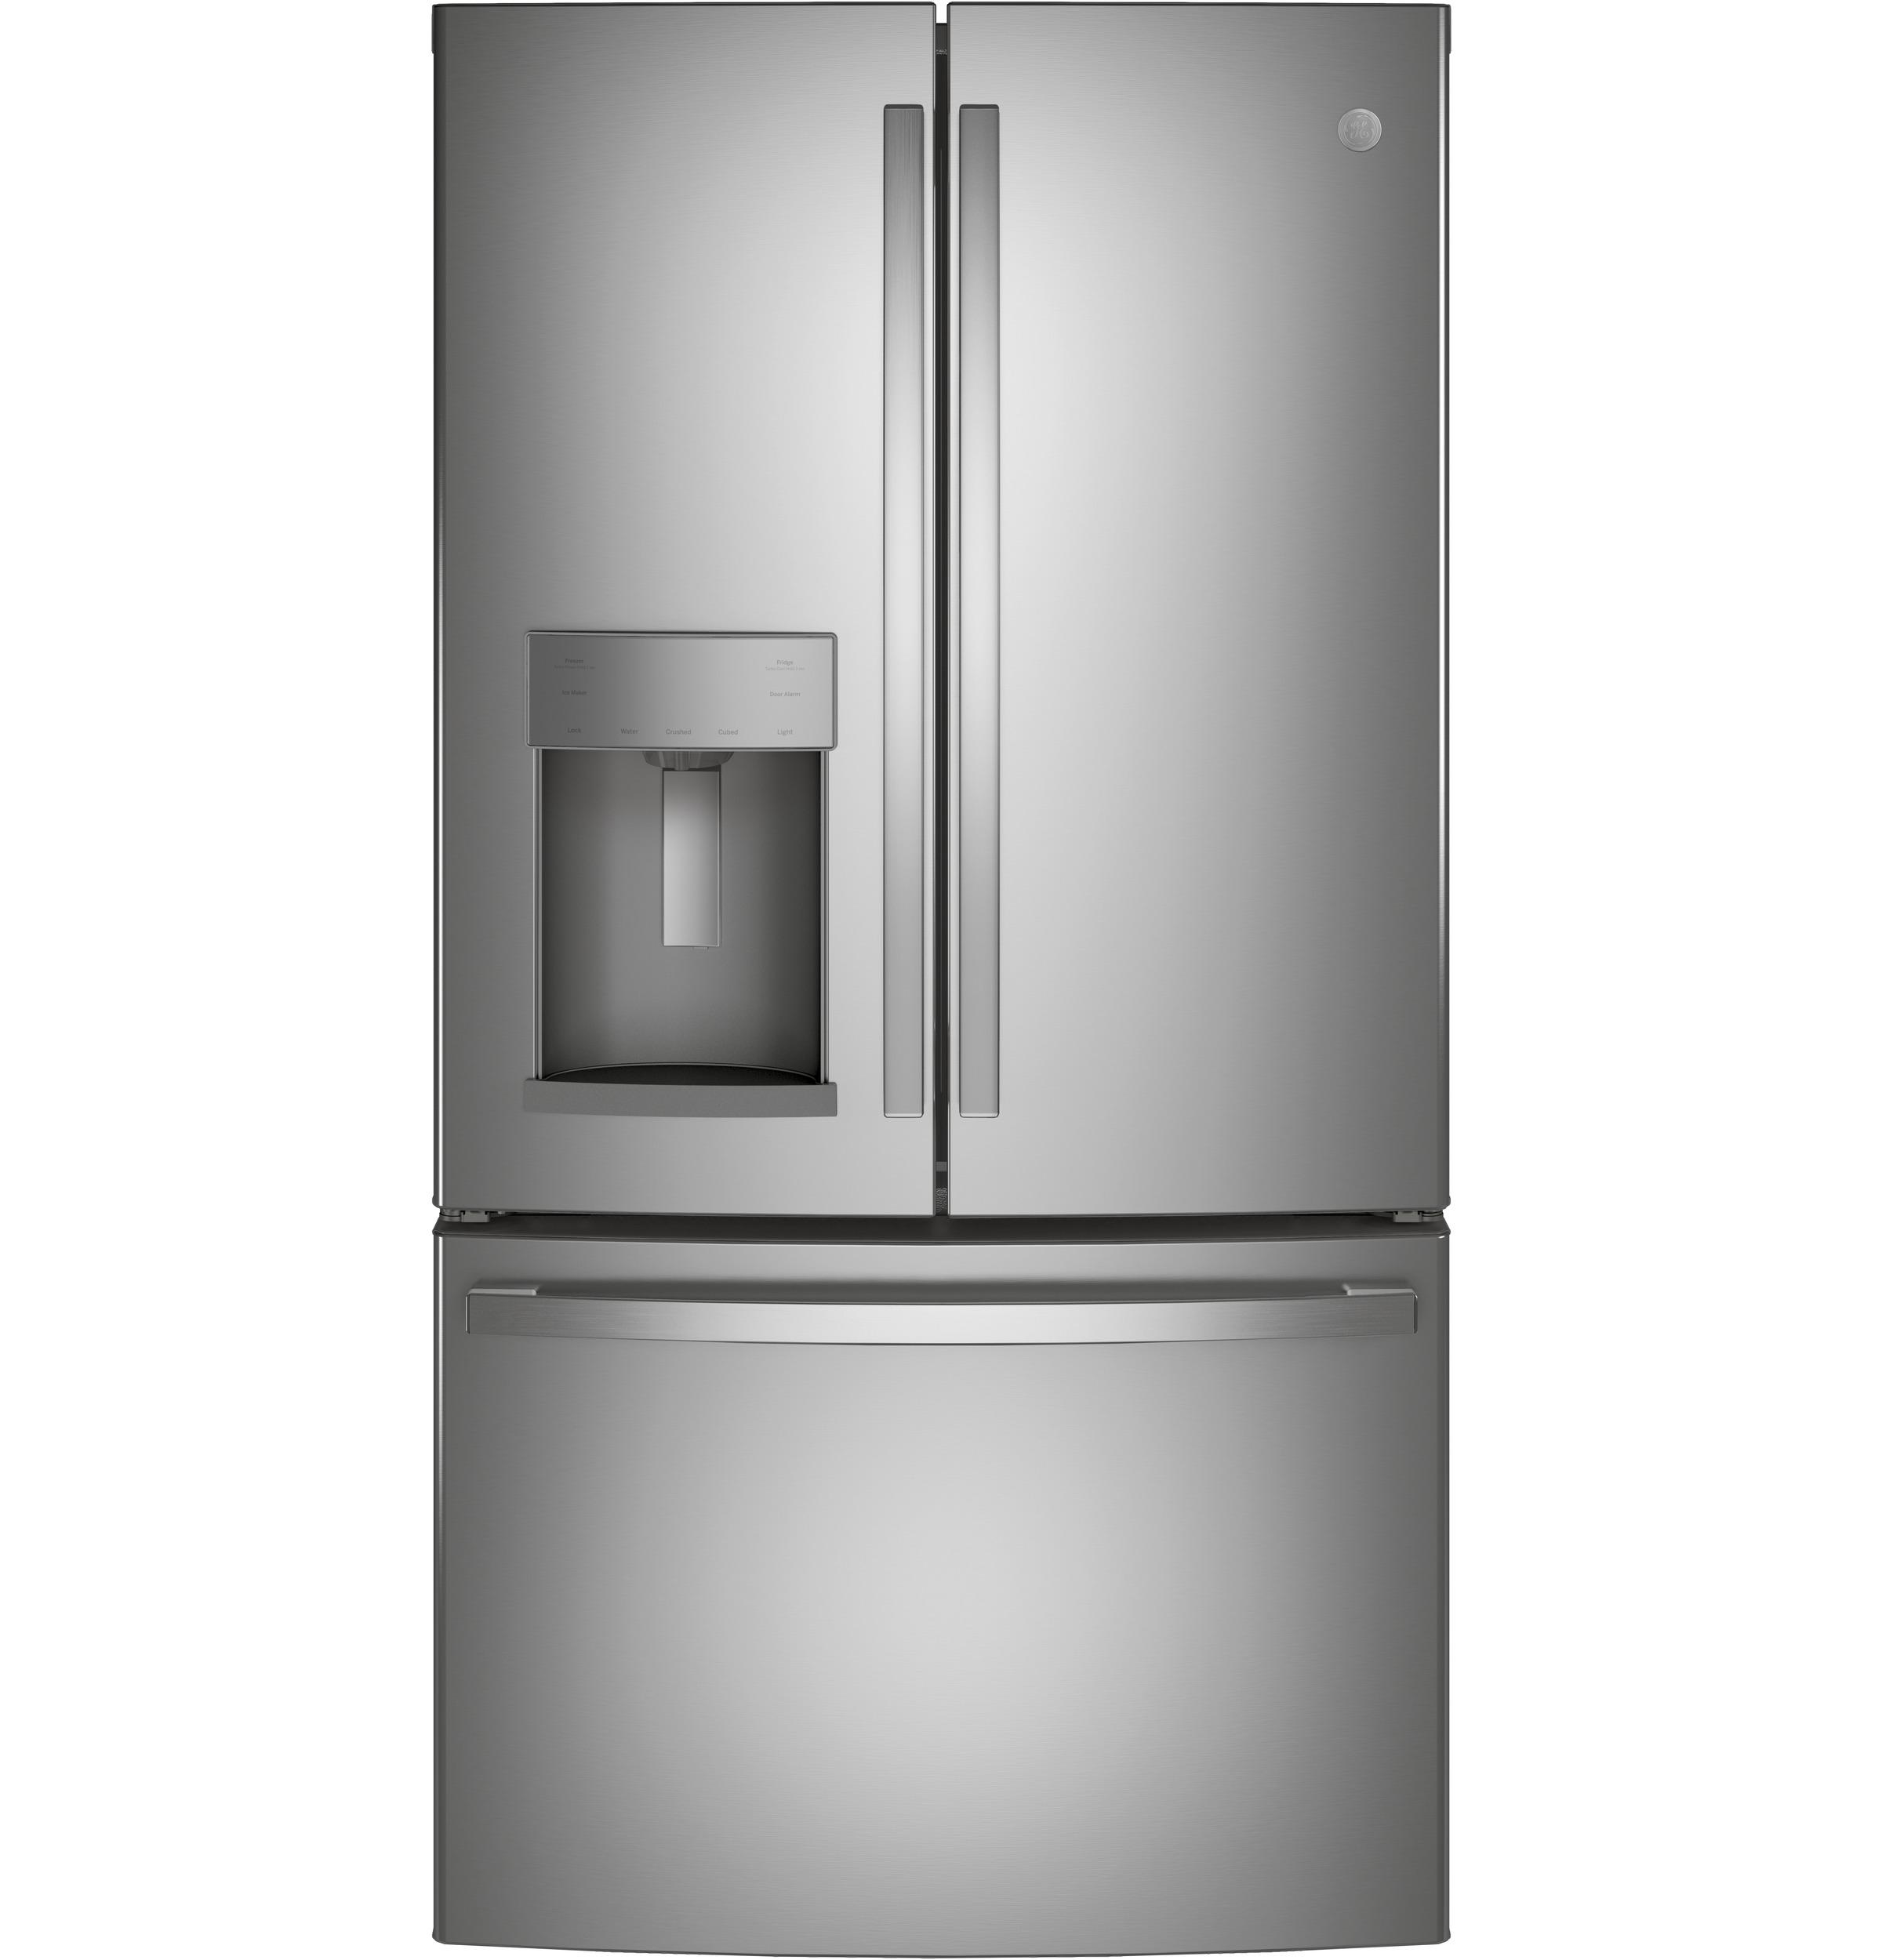 GE GE® ENERGY STAR® 22.1 Cu. Ft. Counter-Depth French-Door Refrigerator